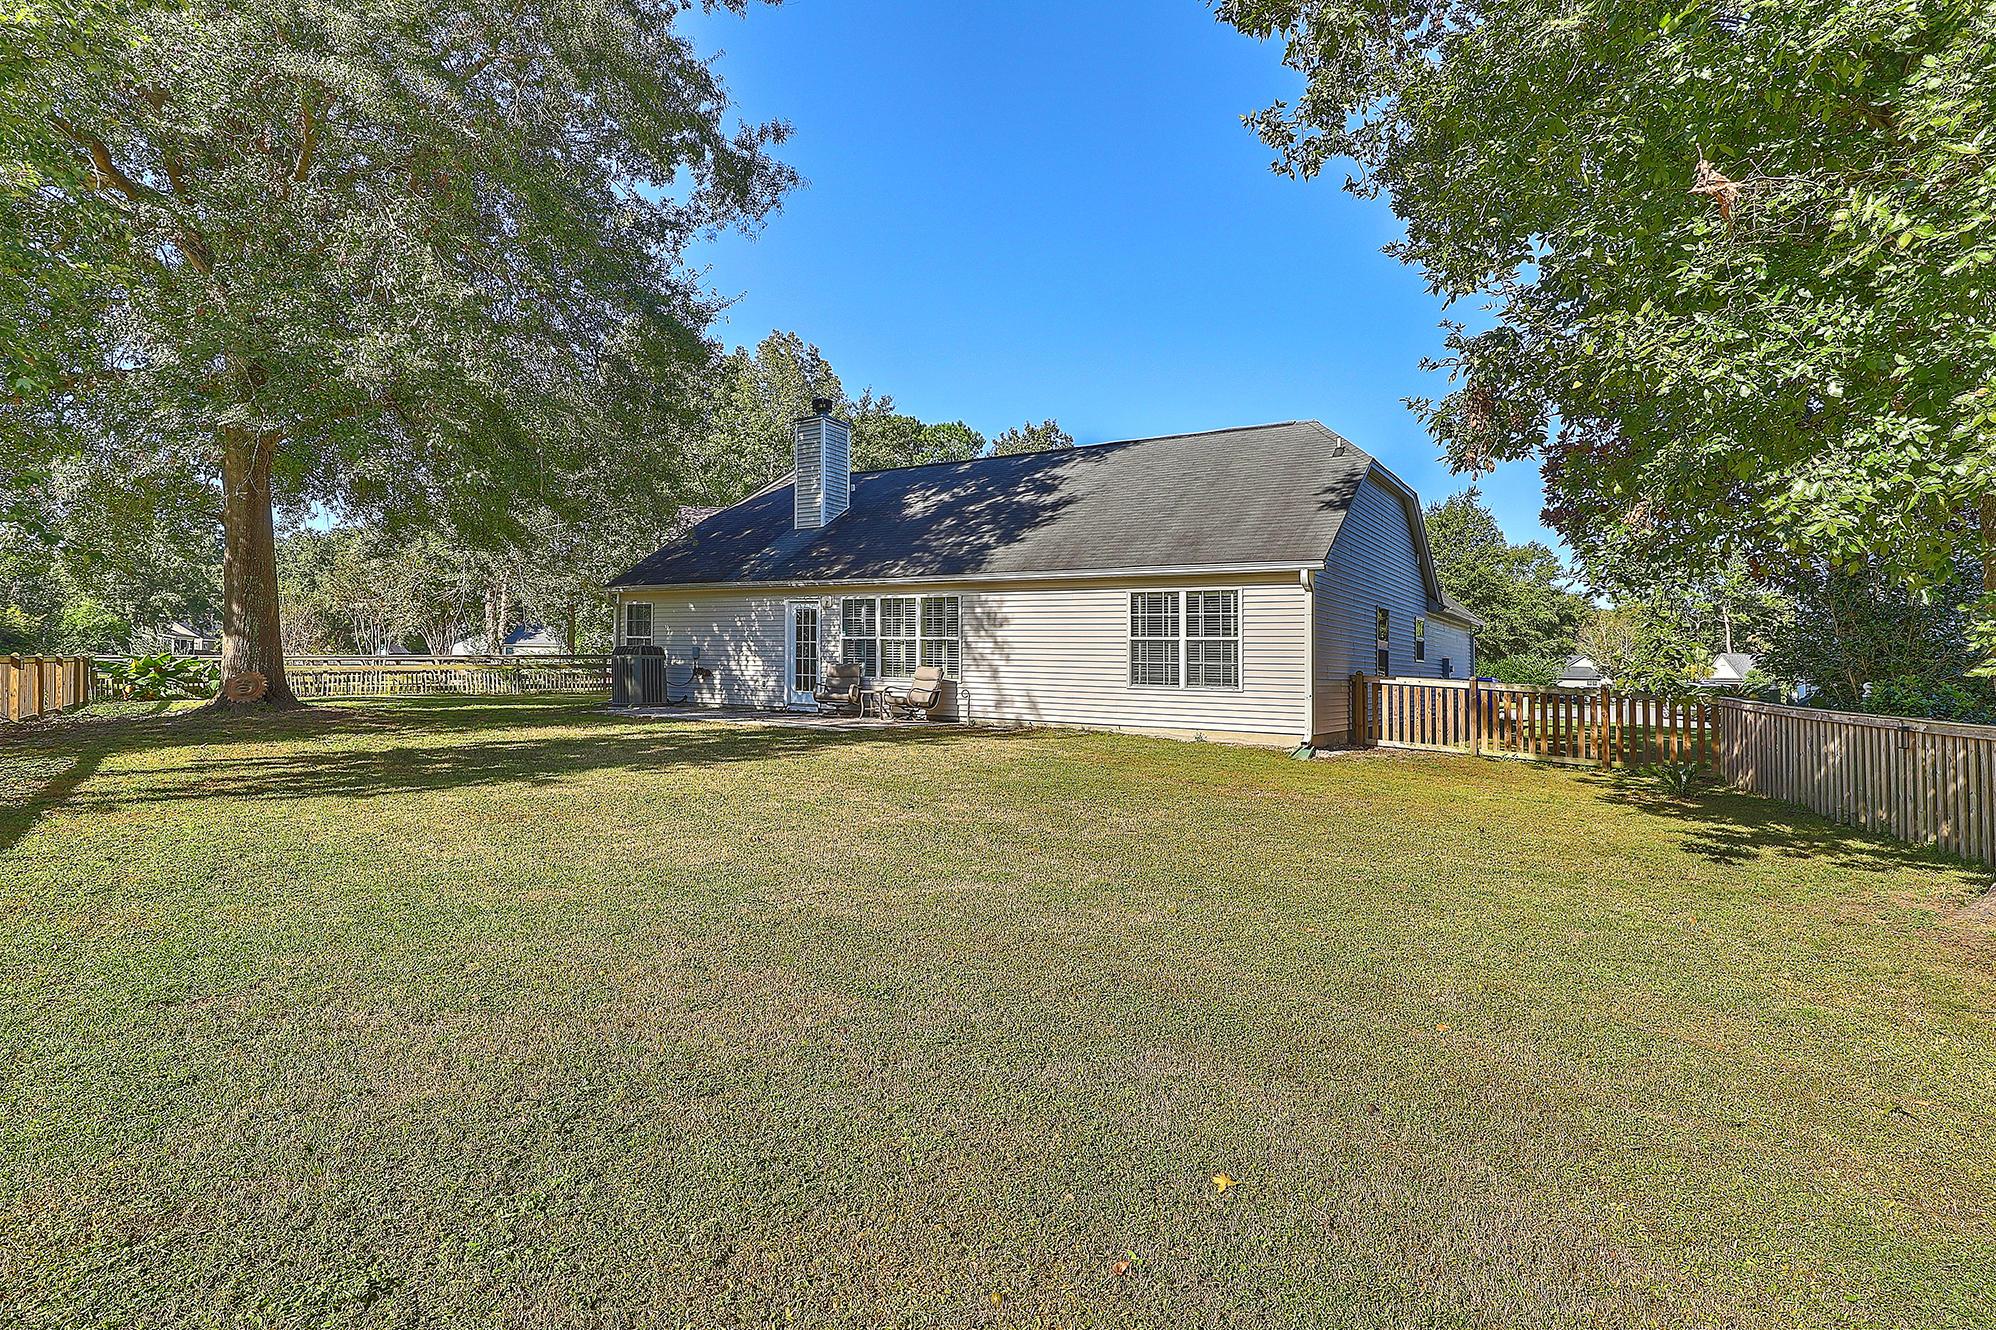 Planters Pointe Homes For Sale - 2740 Four Winds, Mount Pleasant, SC - 26